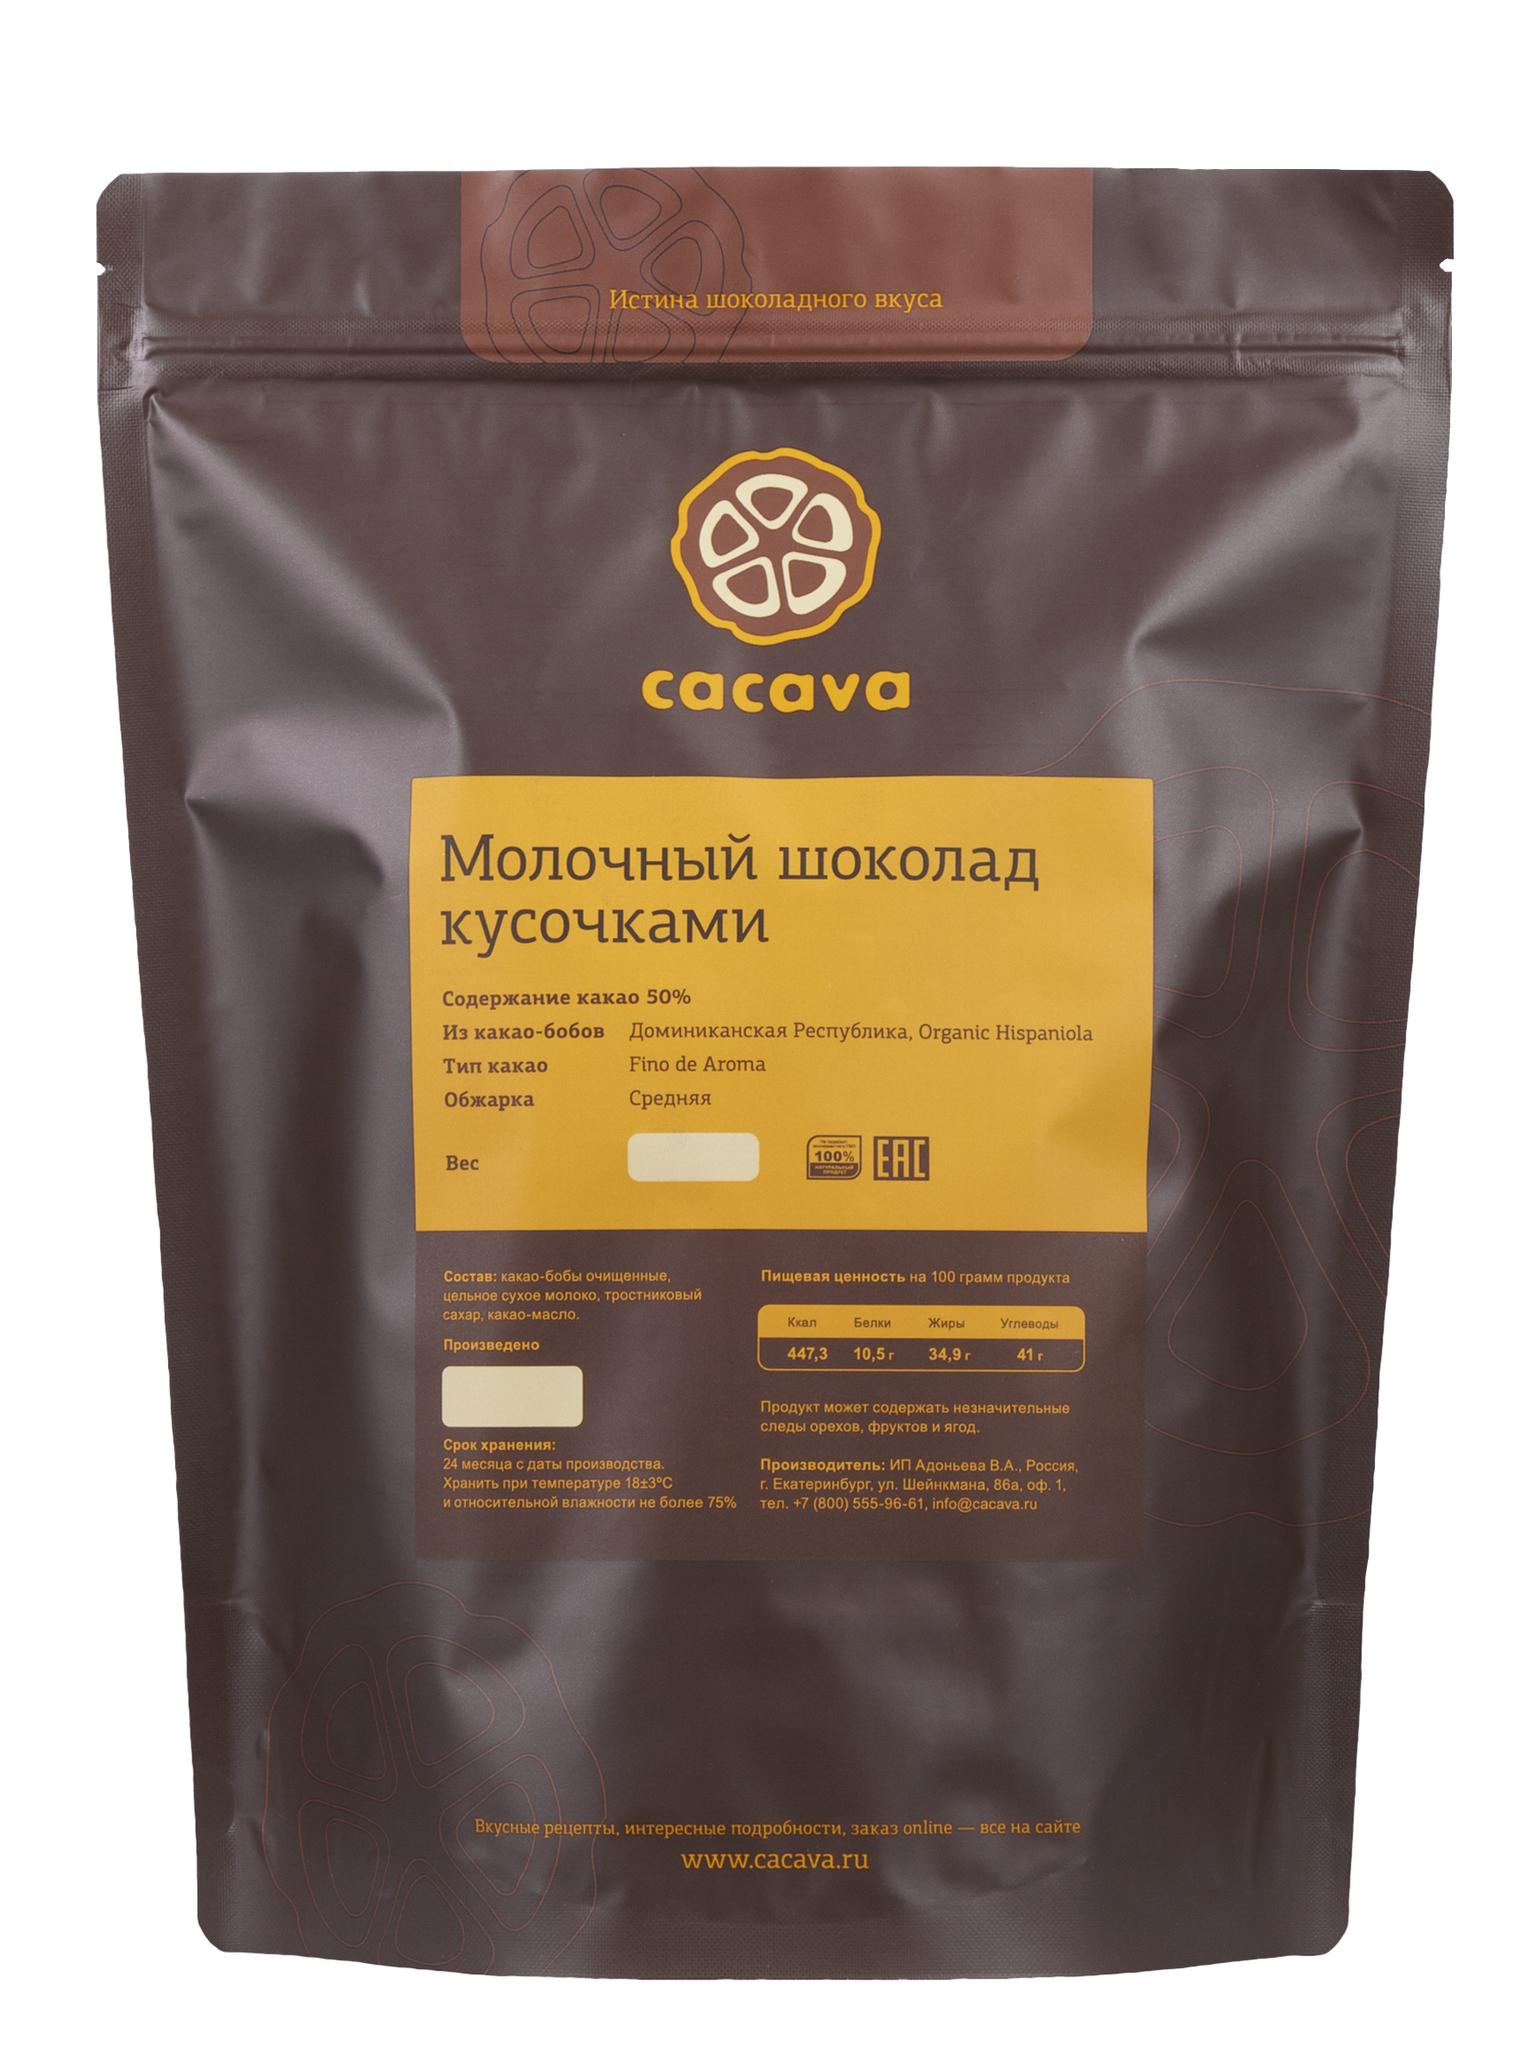 Молочный шоколад 50 % какао (Доминикана), упаковка 1 кг